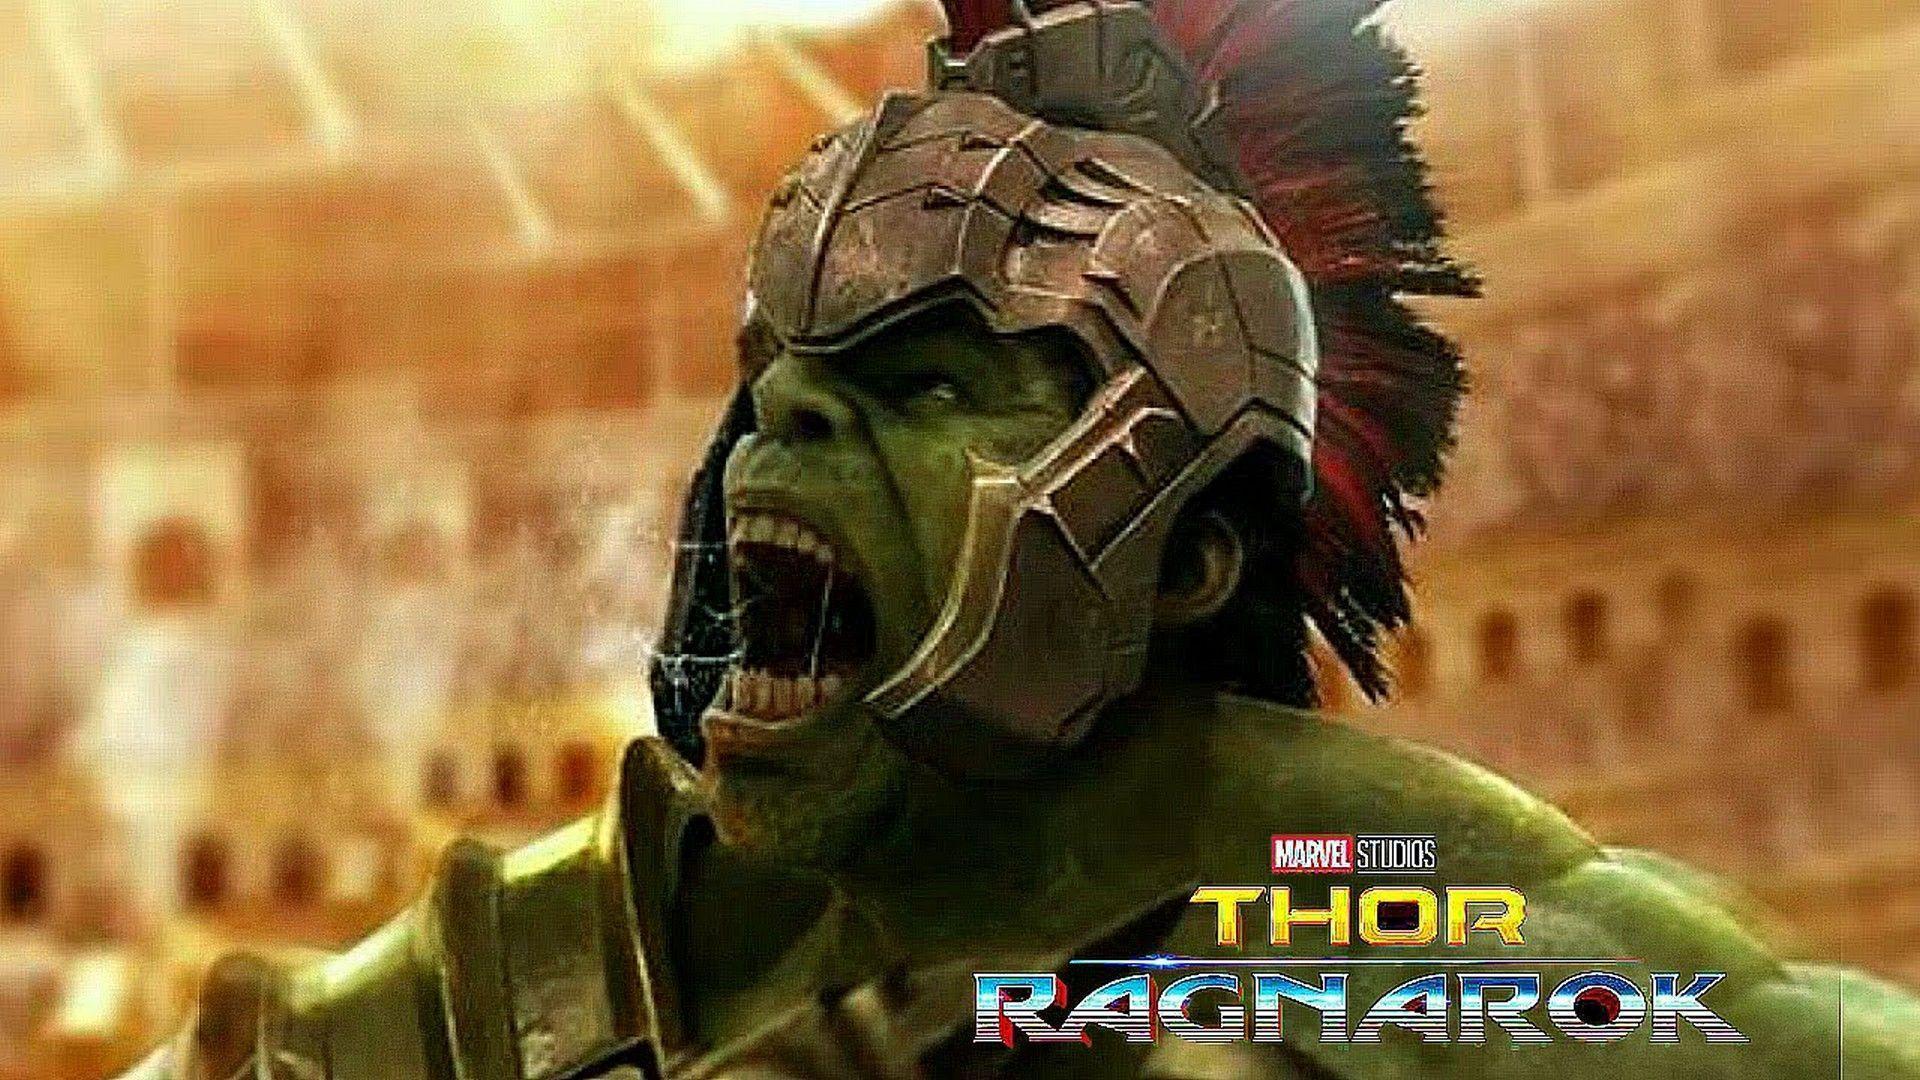 Hulk Ragnarok Wallpapers Top Free Hulk Ragnarok Backgrounds Wallpaperaccess